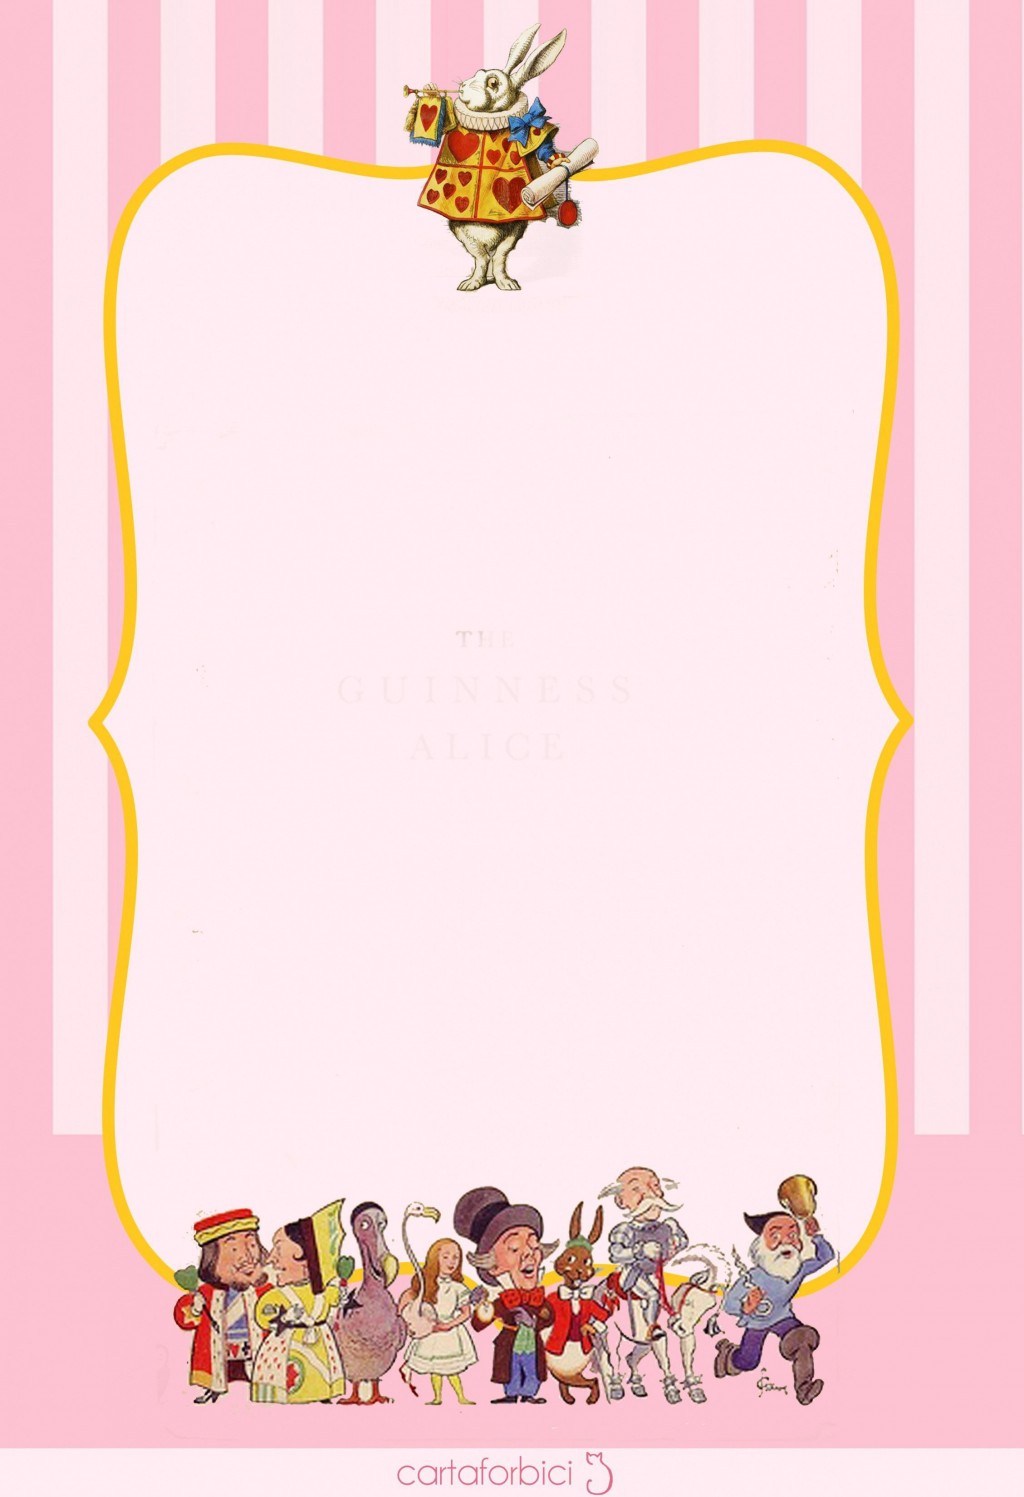 001 Wondrou Alice In Wonderland Invitation Template Design  Templates Wedding Birthday Free Tea PartyLarge